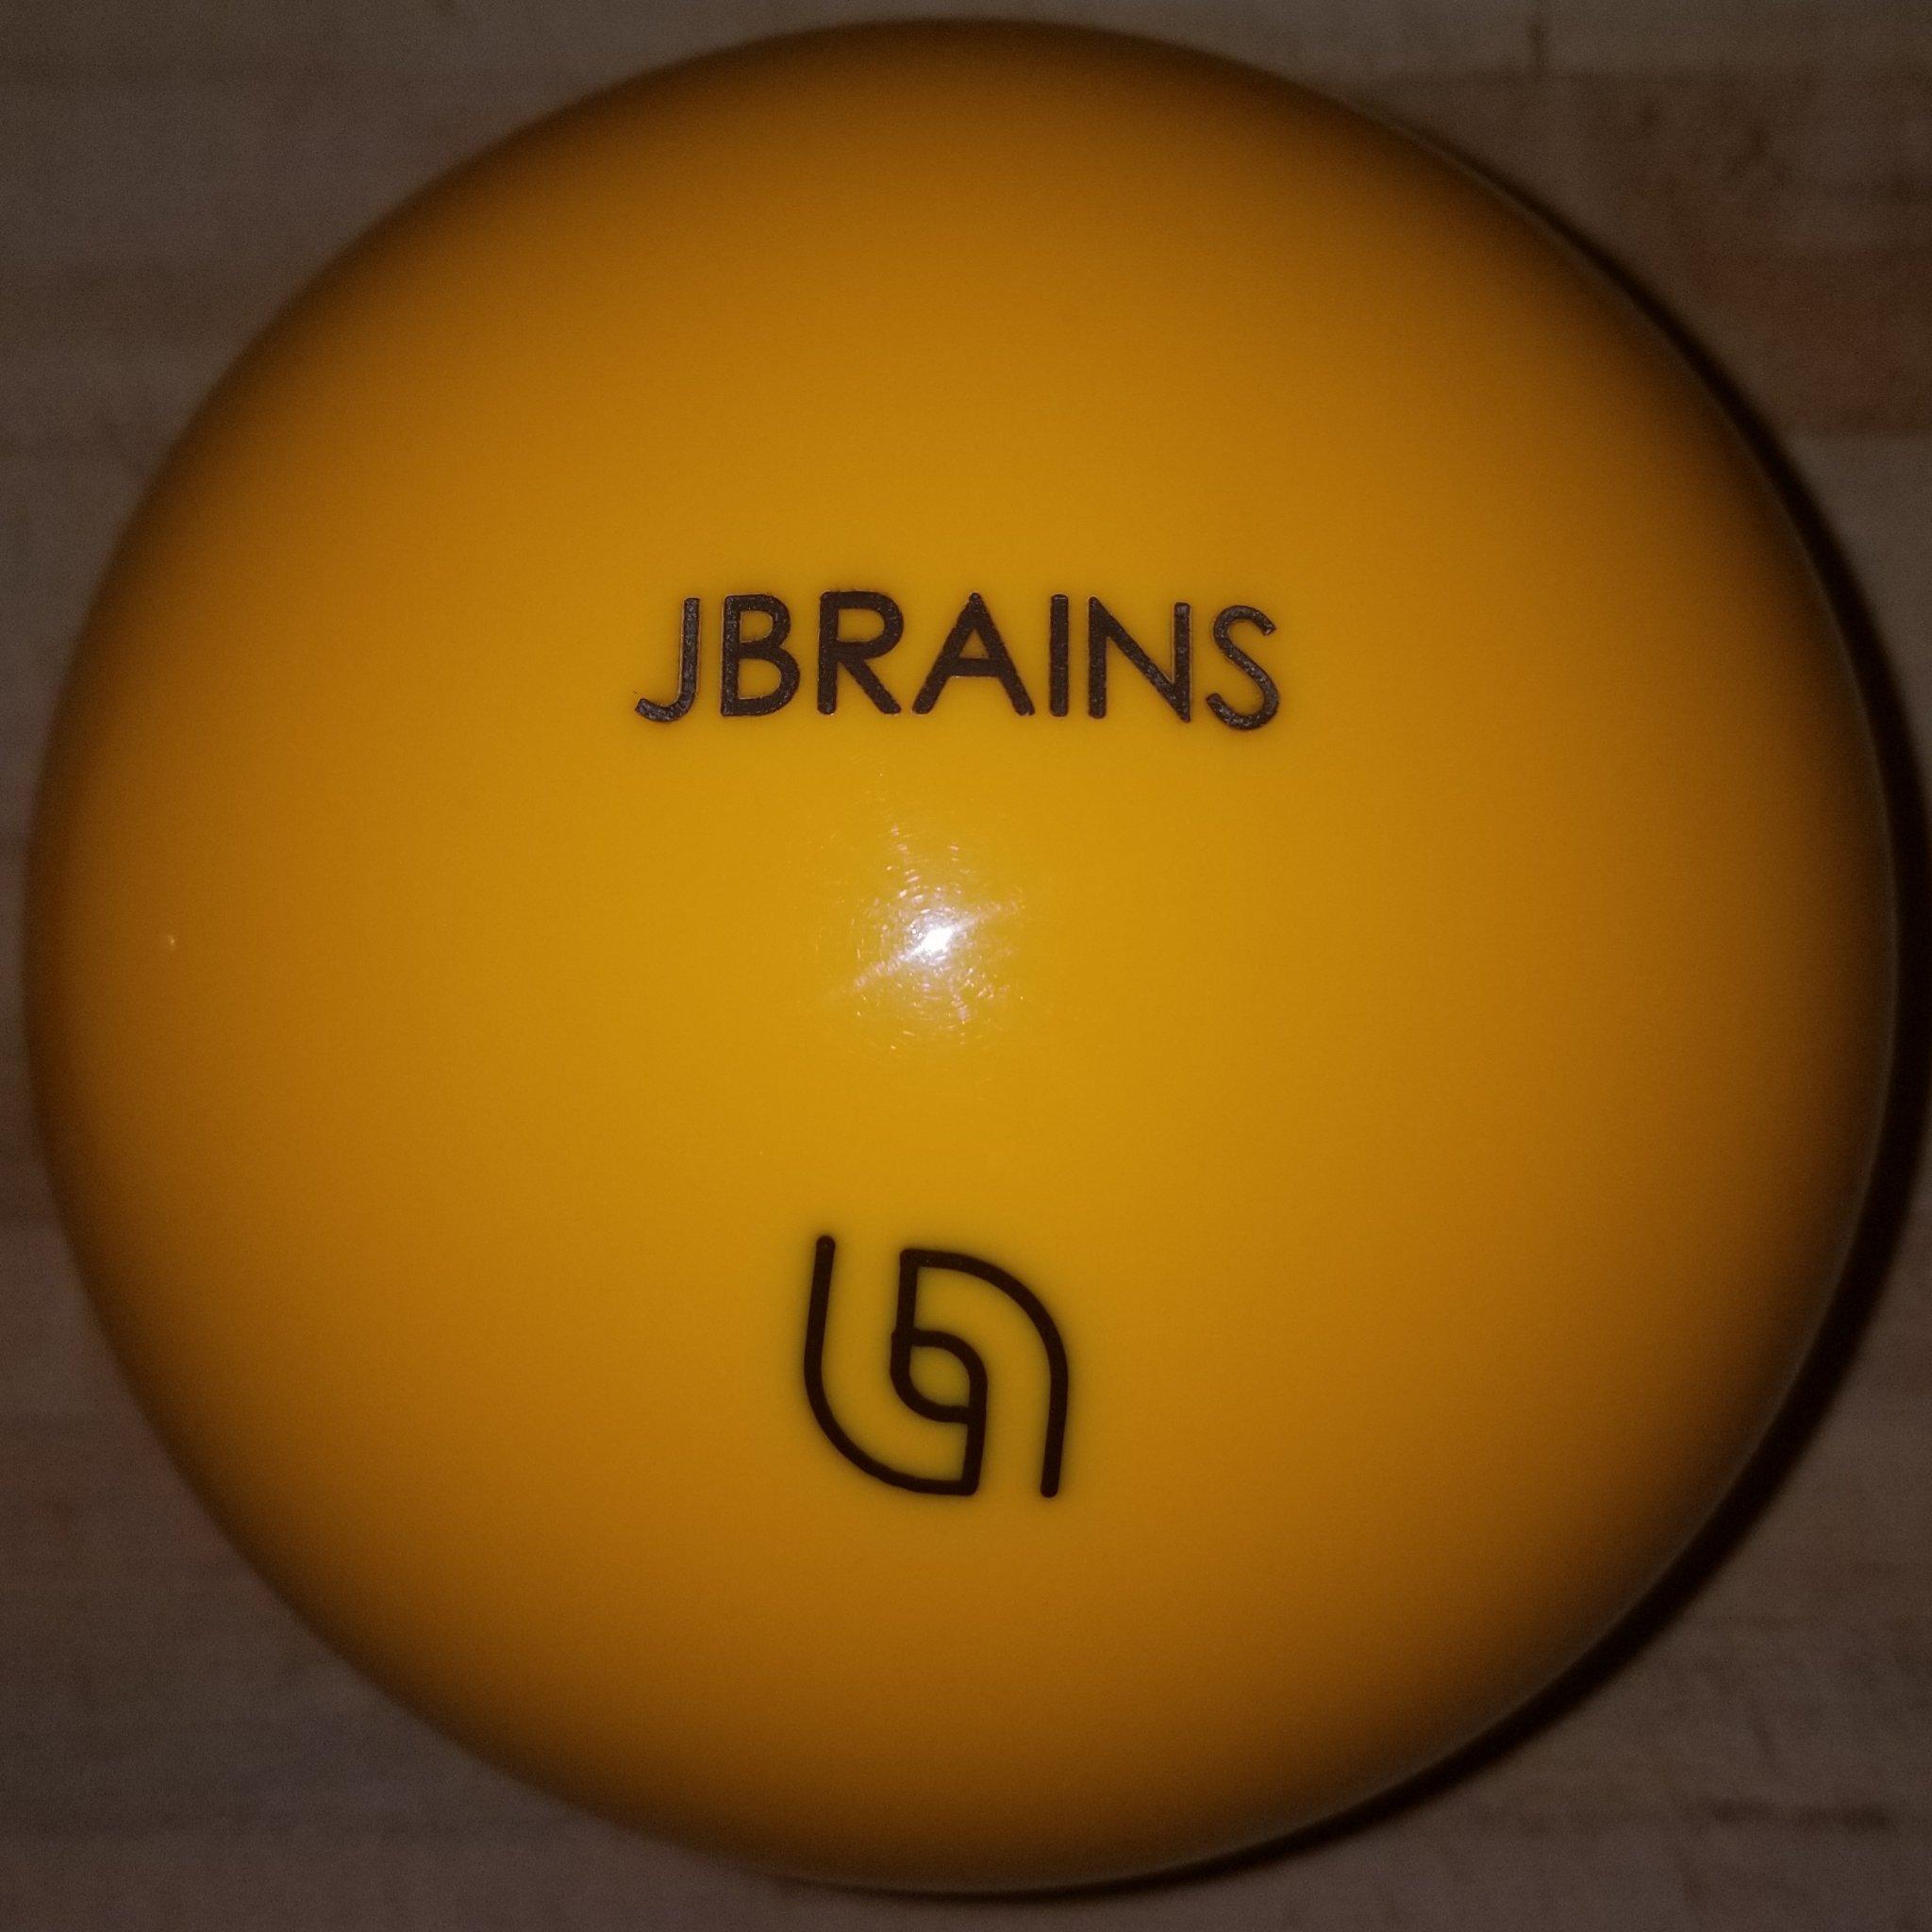 jbrains